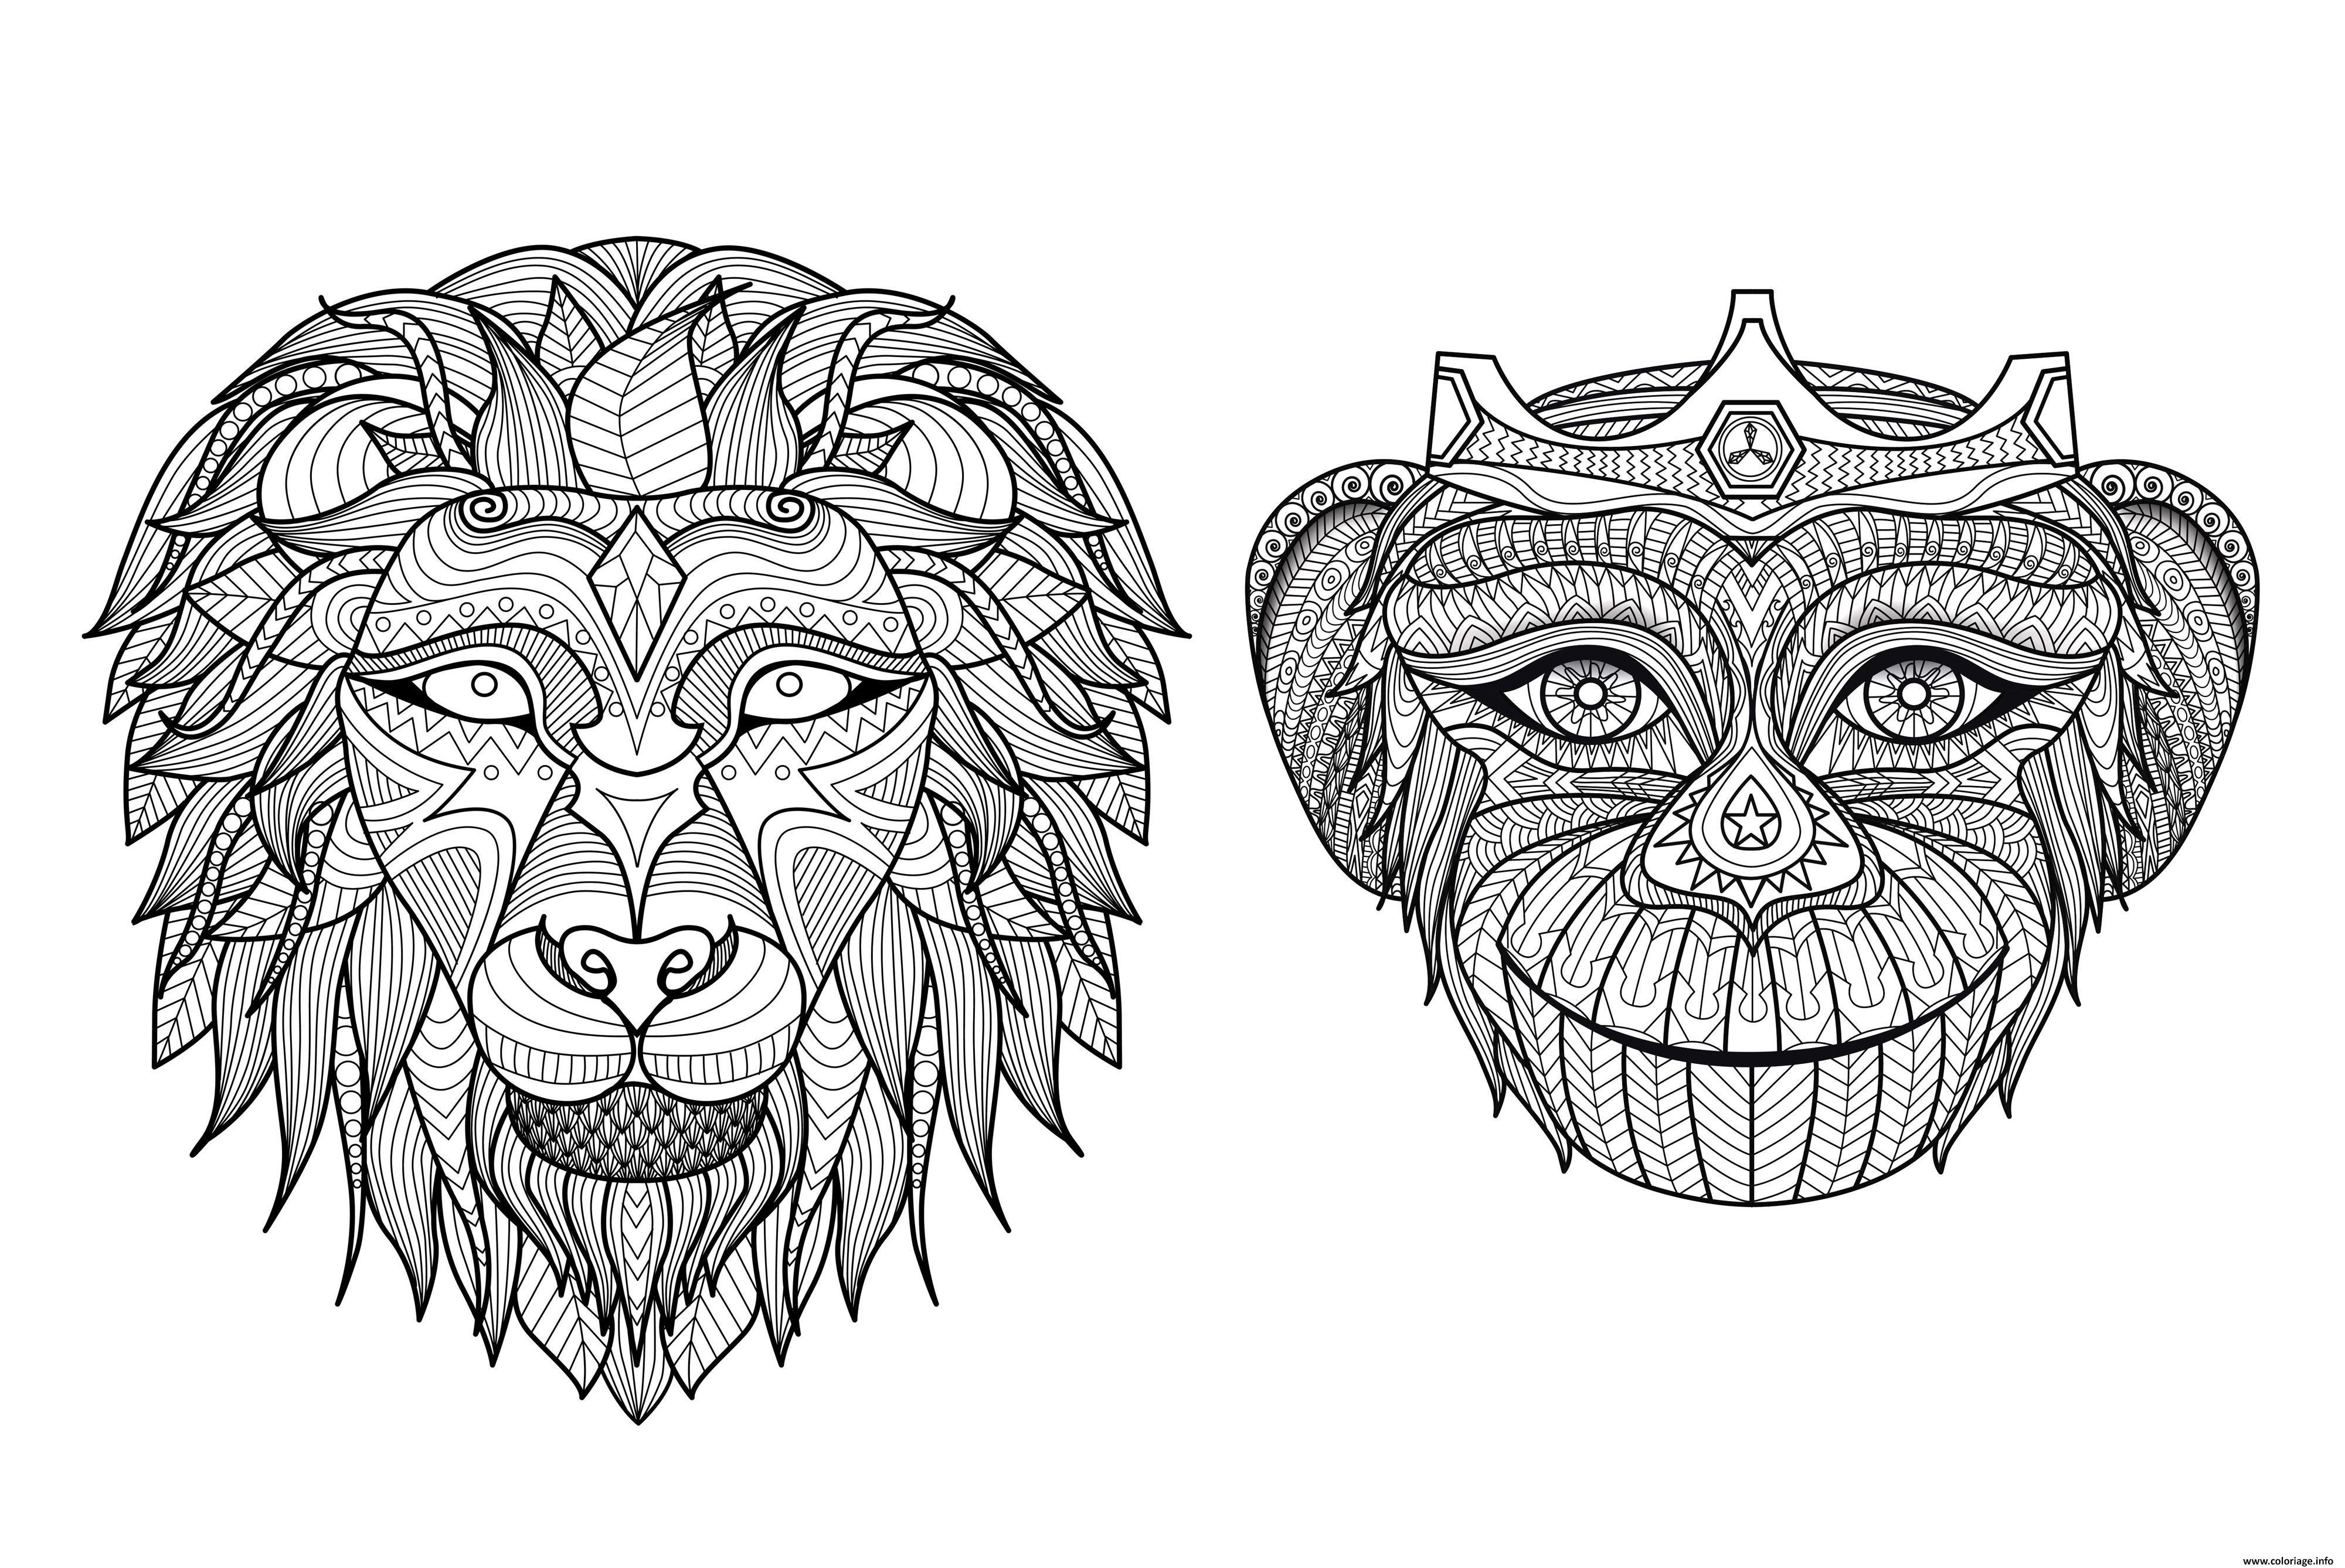 Coloriage Adulte Singe.Coloriage Adulte Tetes Singe Lion Jecolorie Com